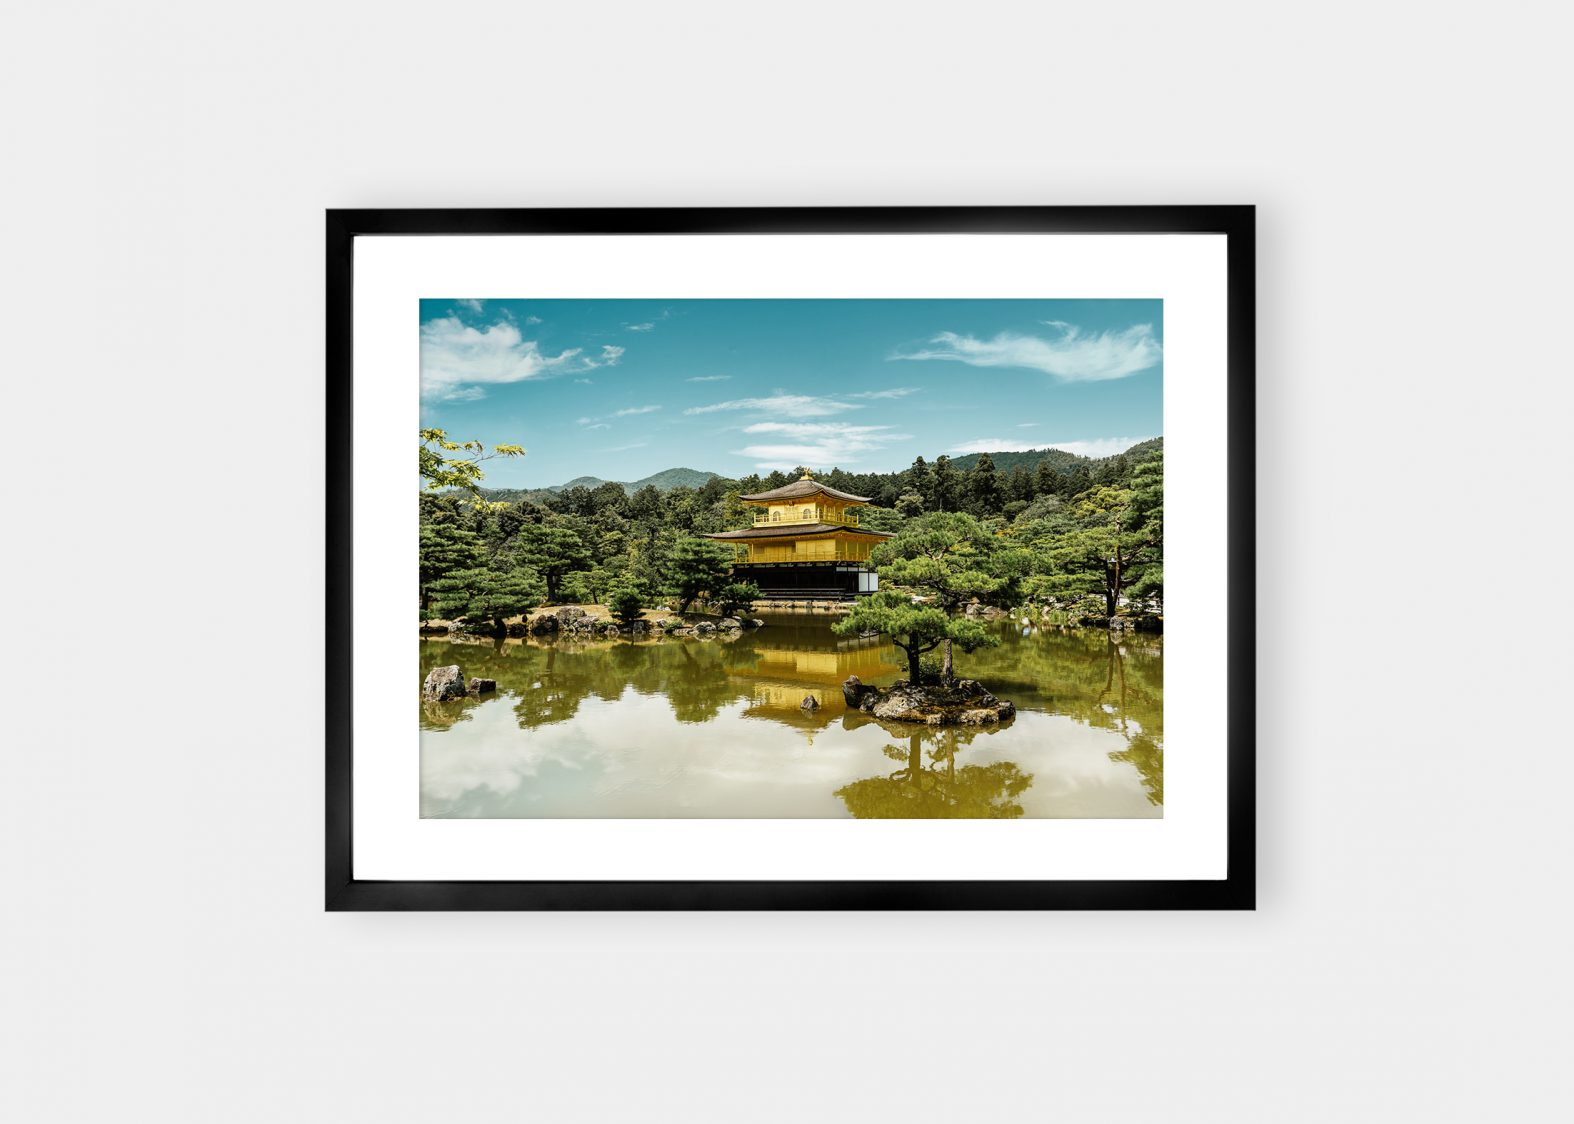 Kinkaku-Ji Tempel Kunst | Fotokunst printet på Fine Art kunstpapir